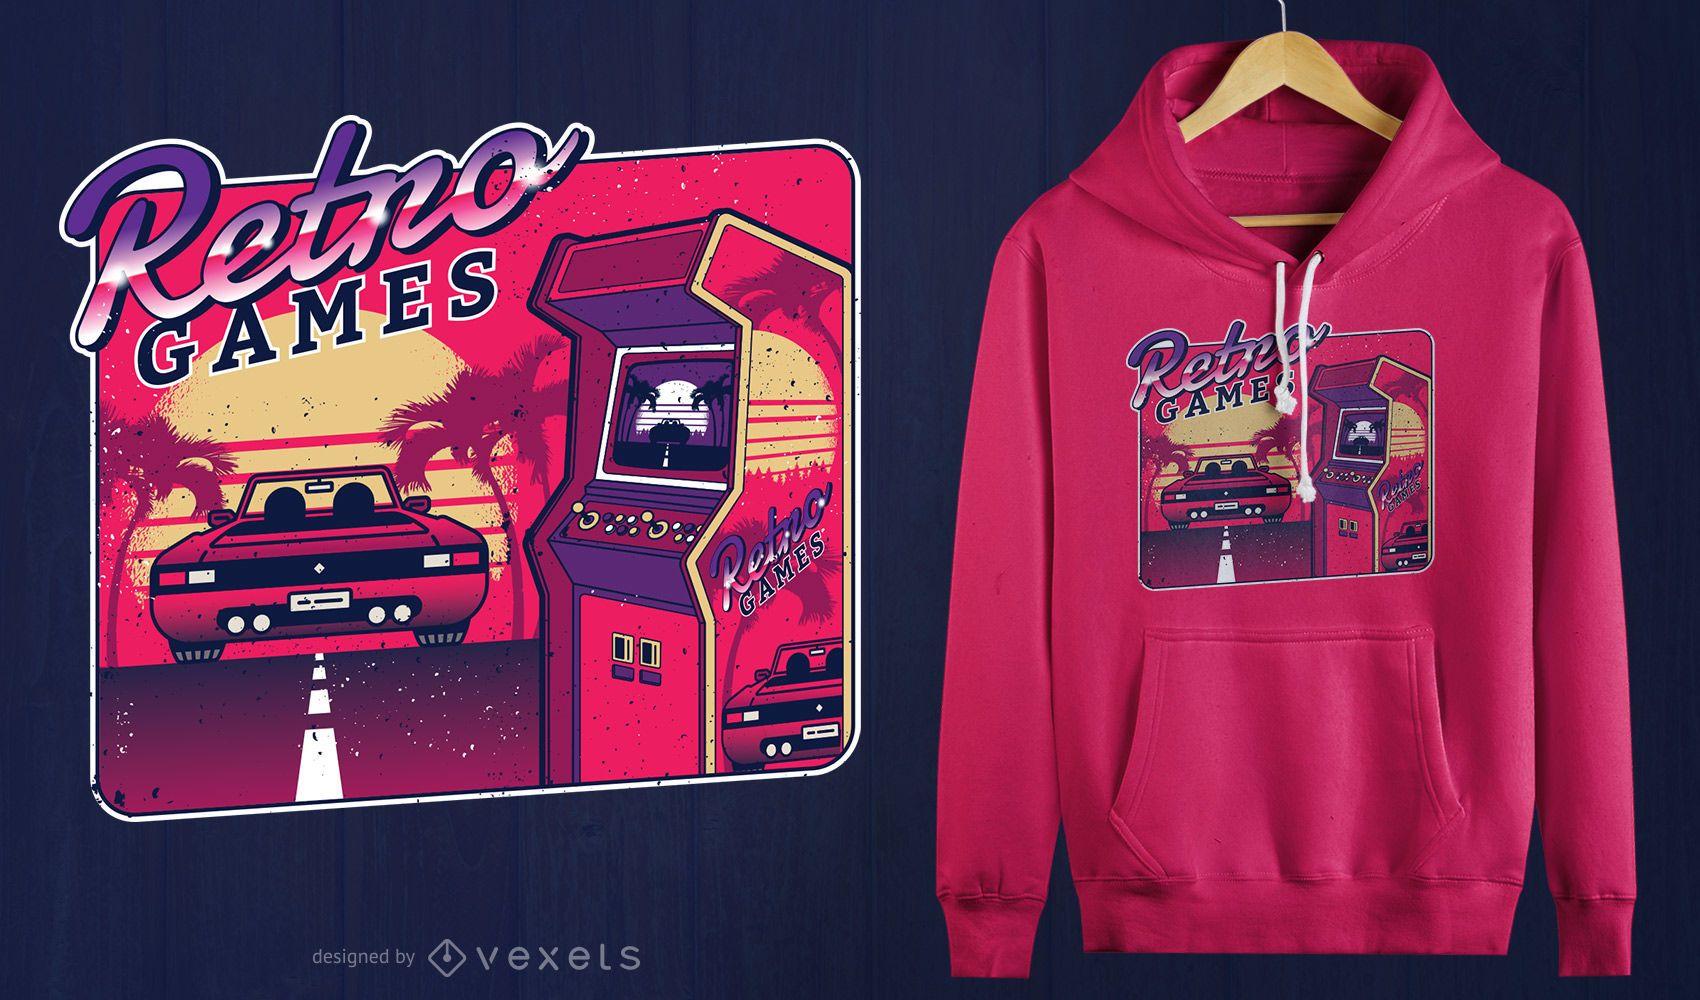 Retro Gaming Arcade T-shirt Design